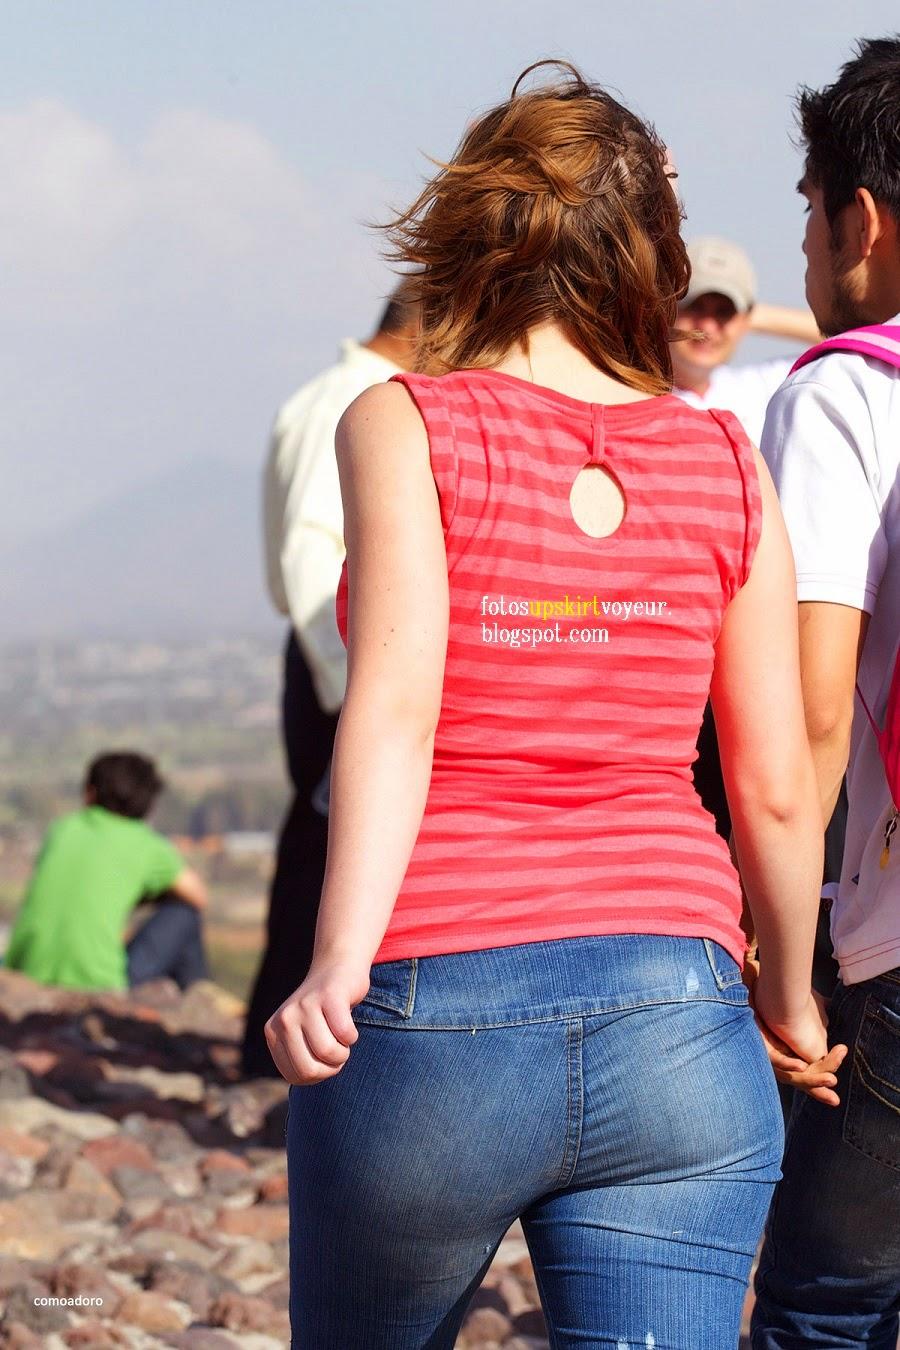 mexicanas con buen trasero en jeans - Sexy girls on the street, girls ...